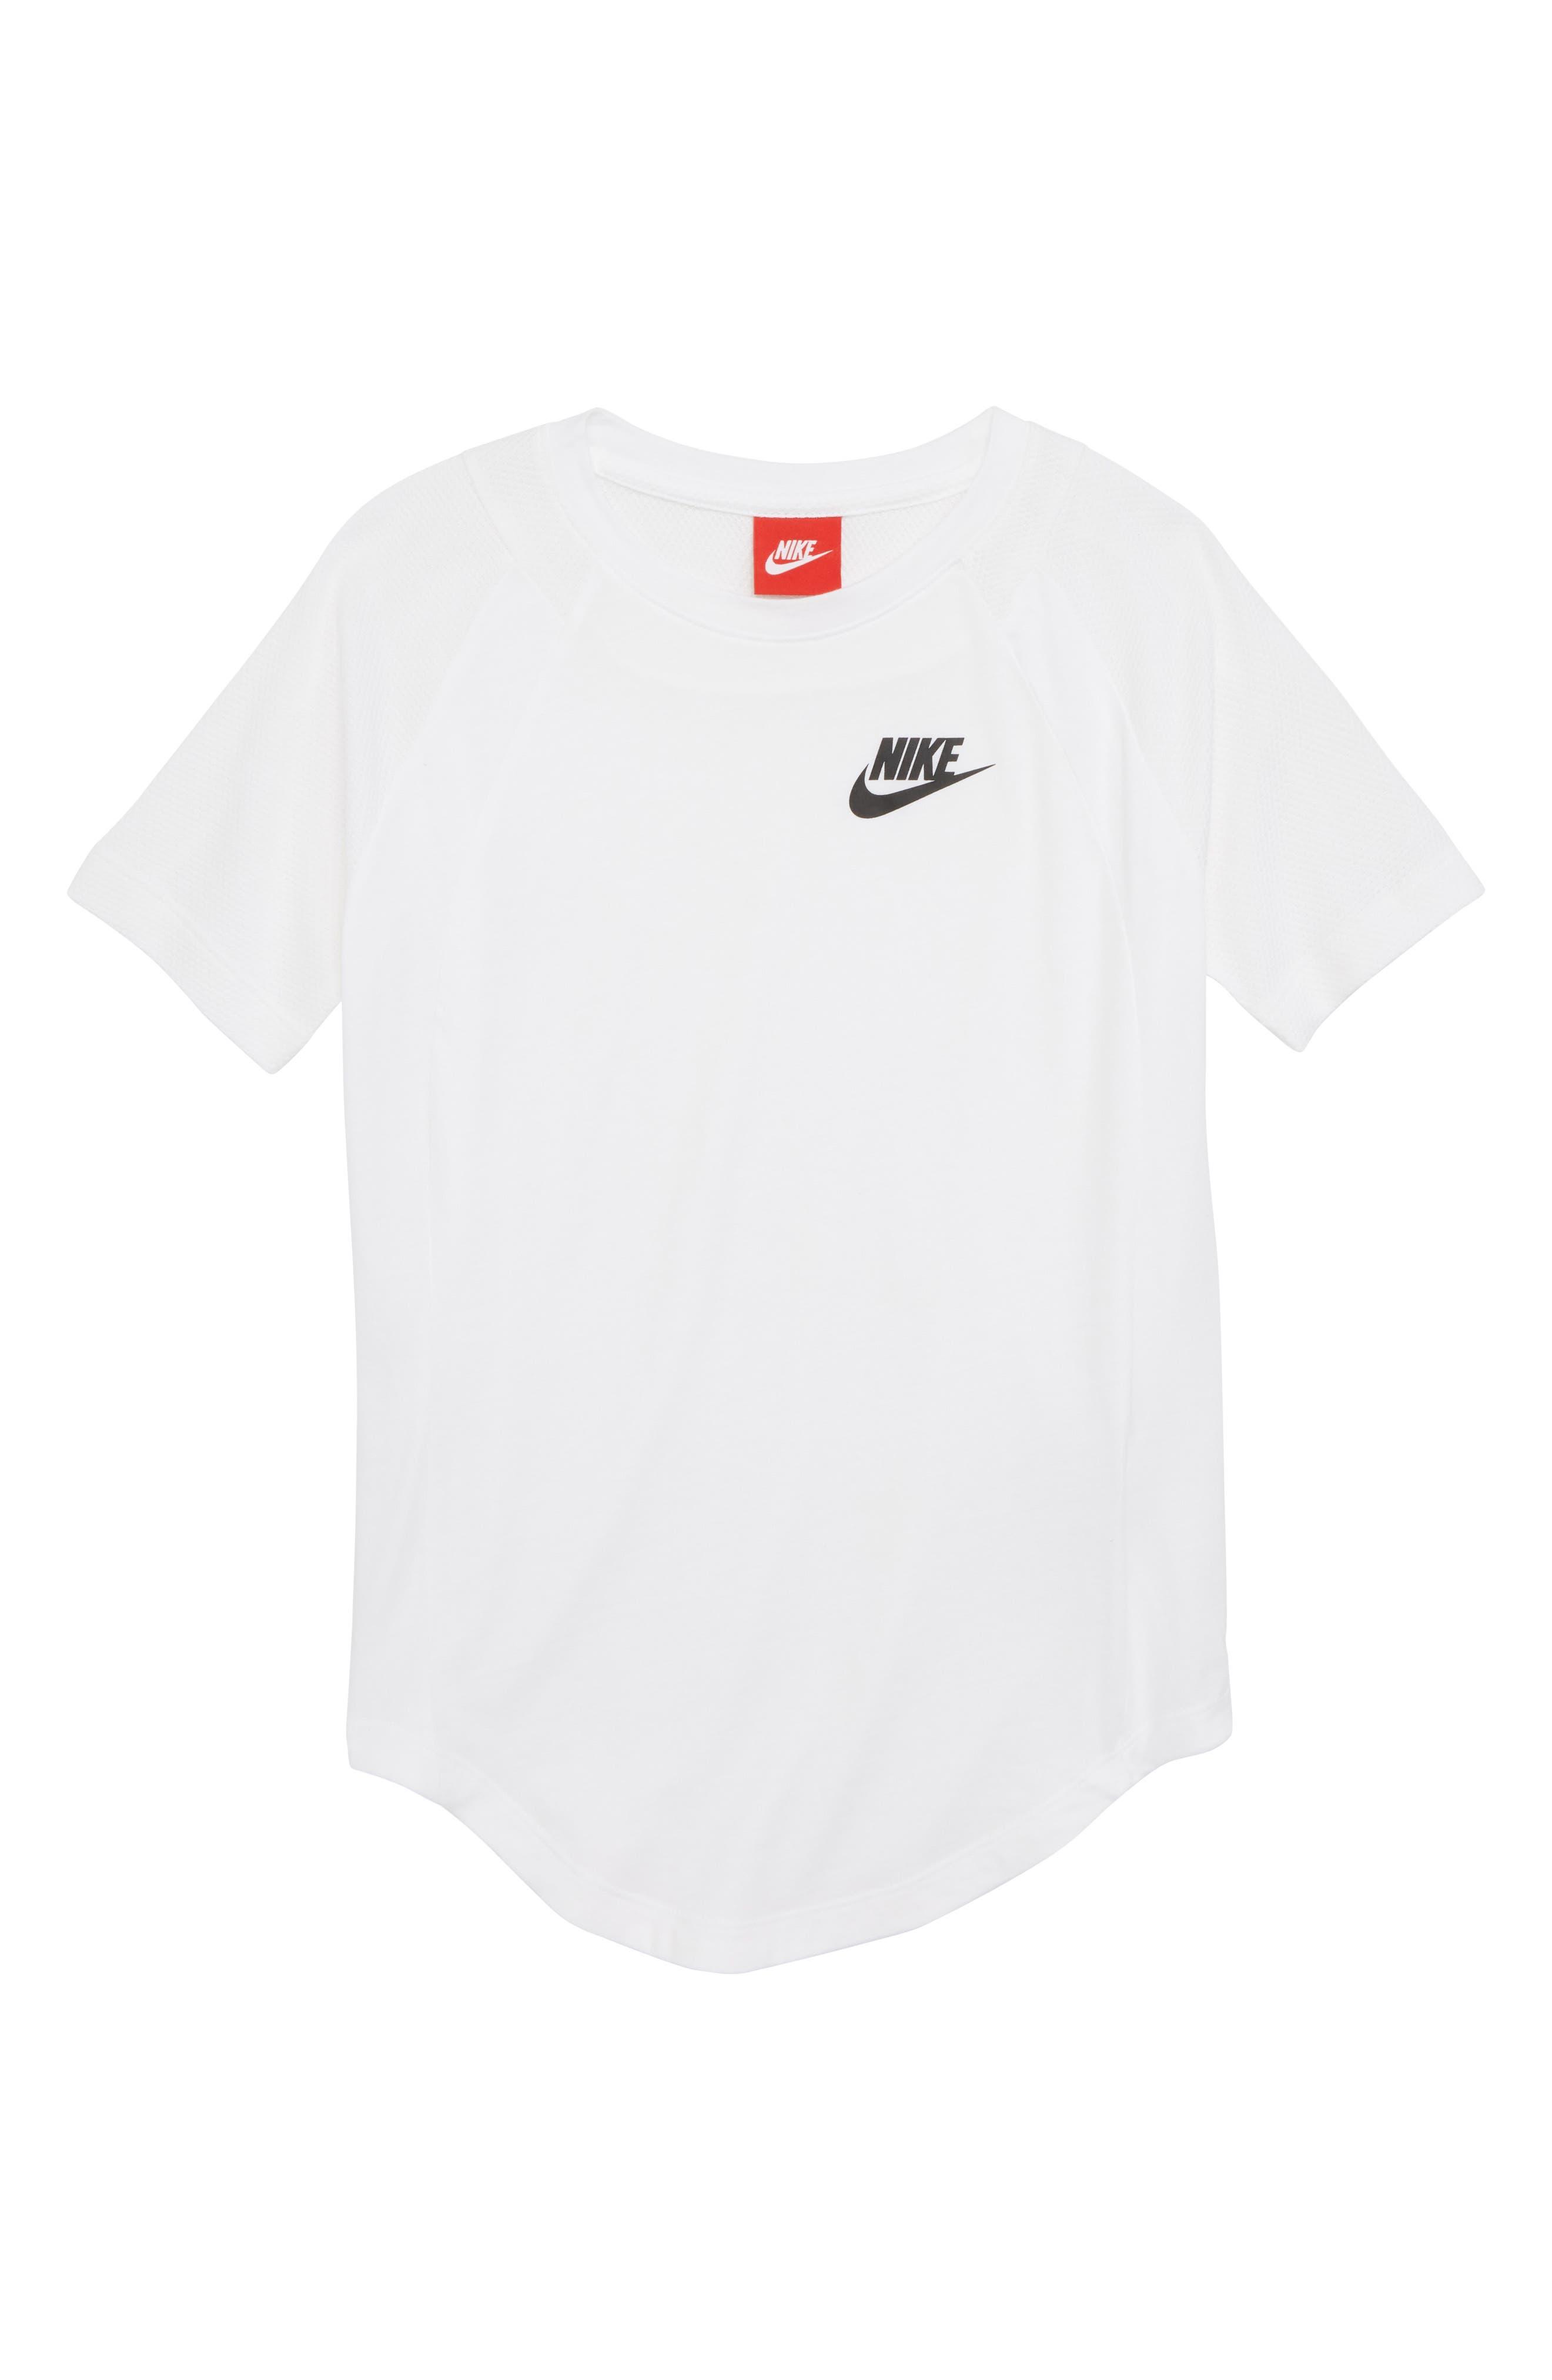 Sportswear Tee,                         Main,                         color, White/ Black